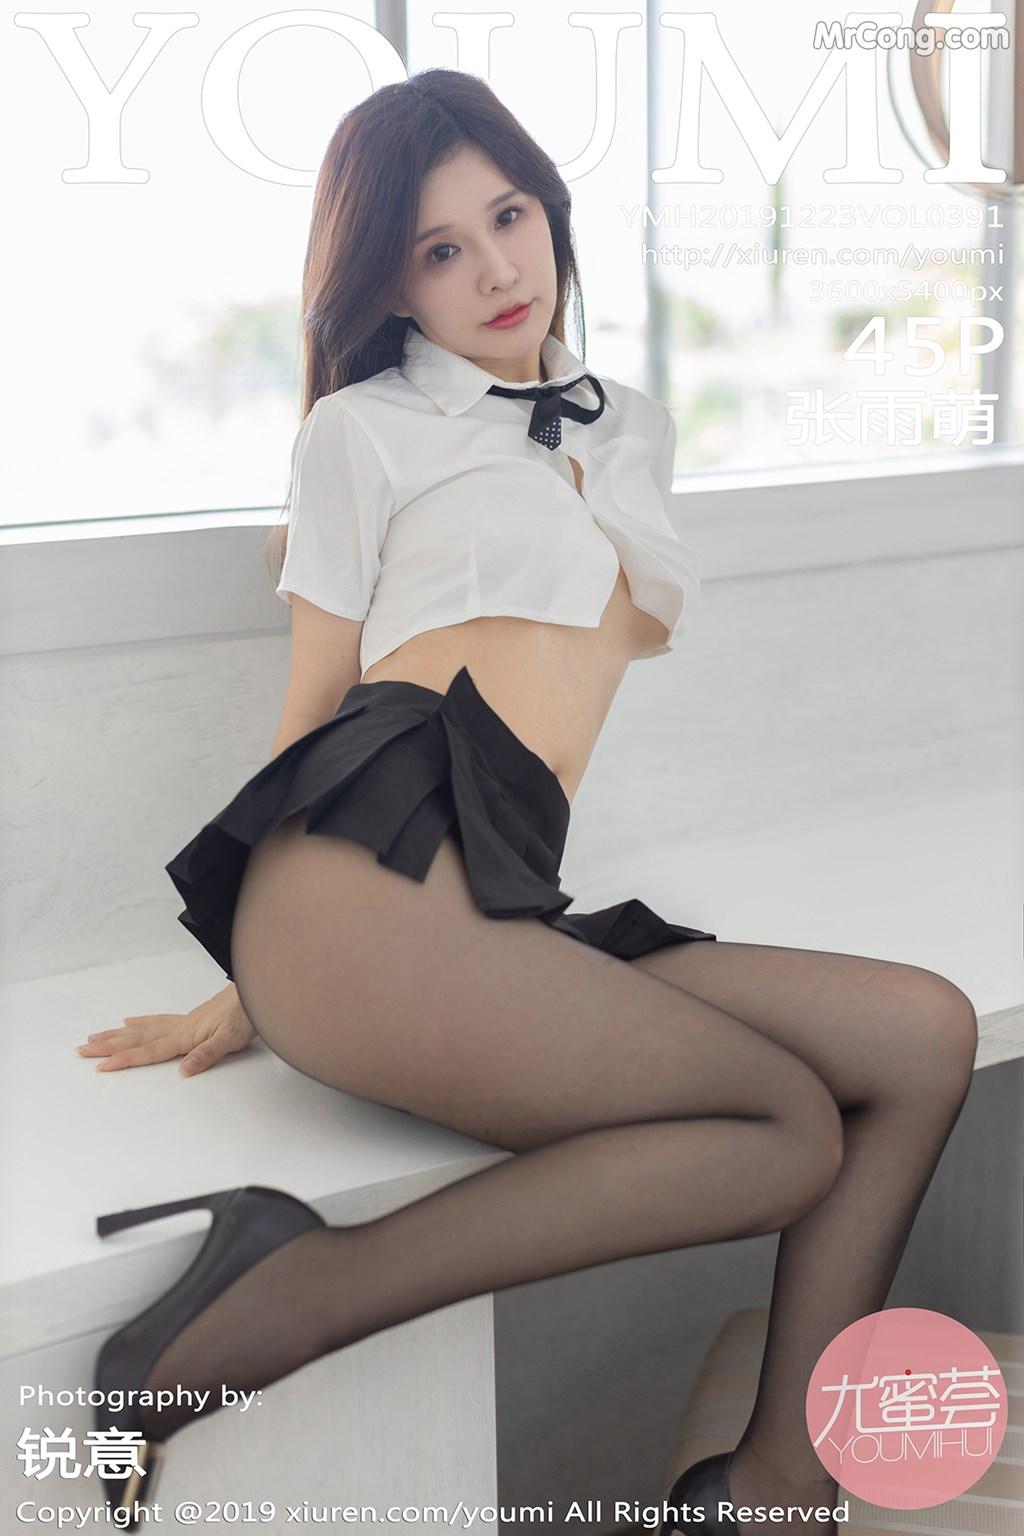 YouMi Vol.391: Zhang Yu Meng (张雨萌) (46 pictures)